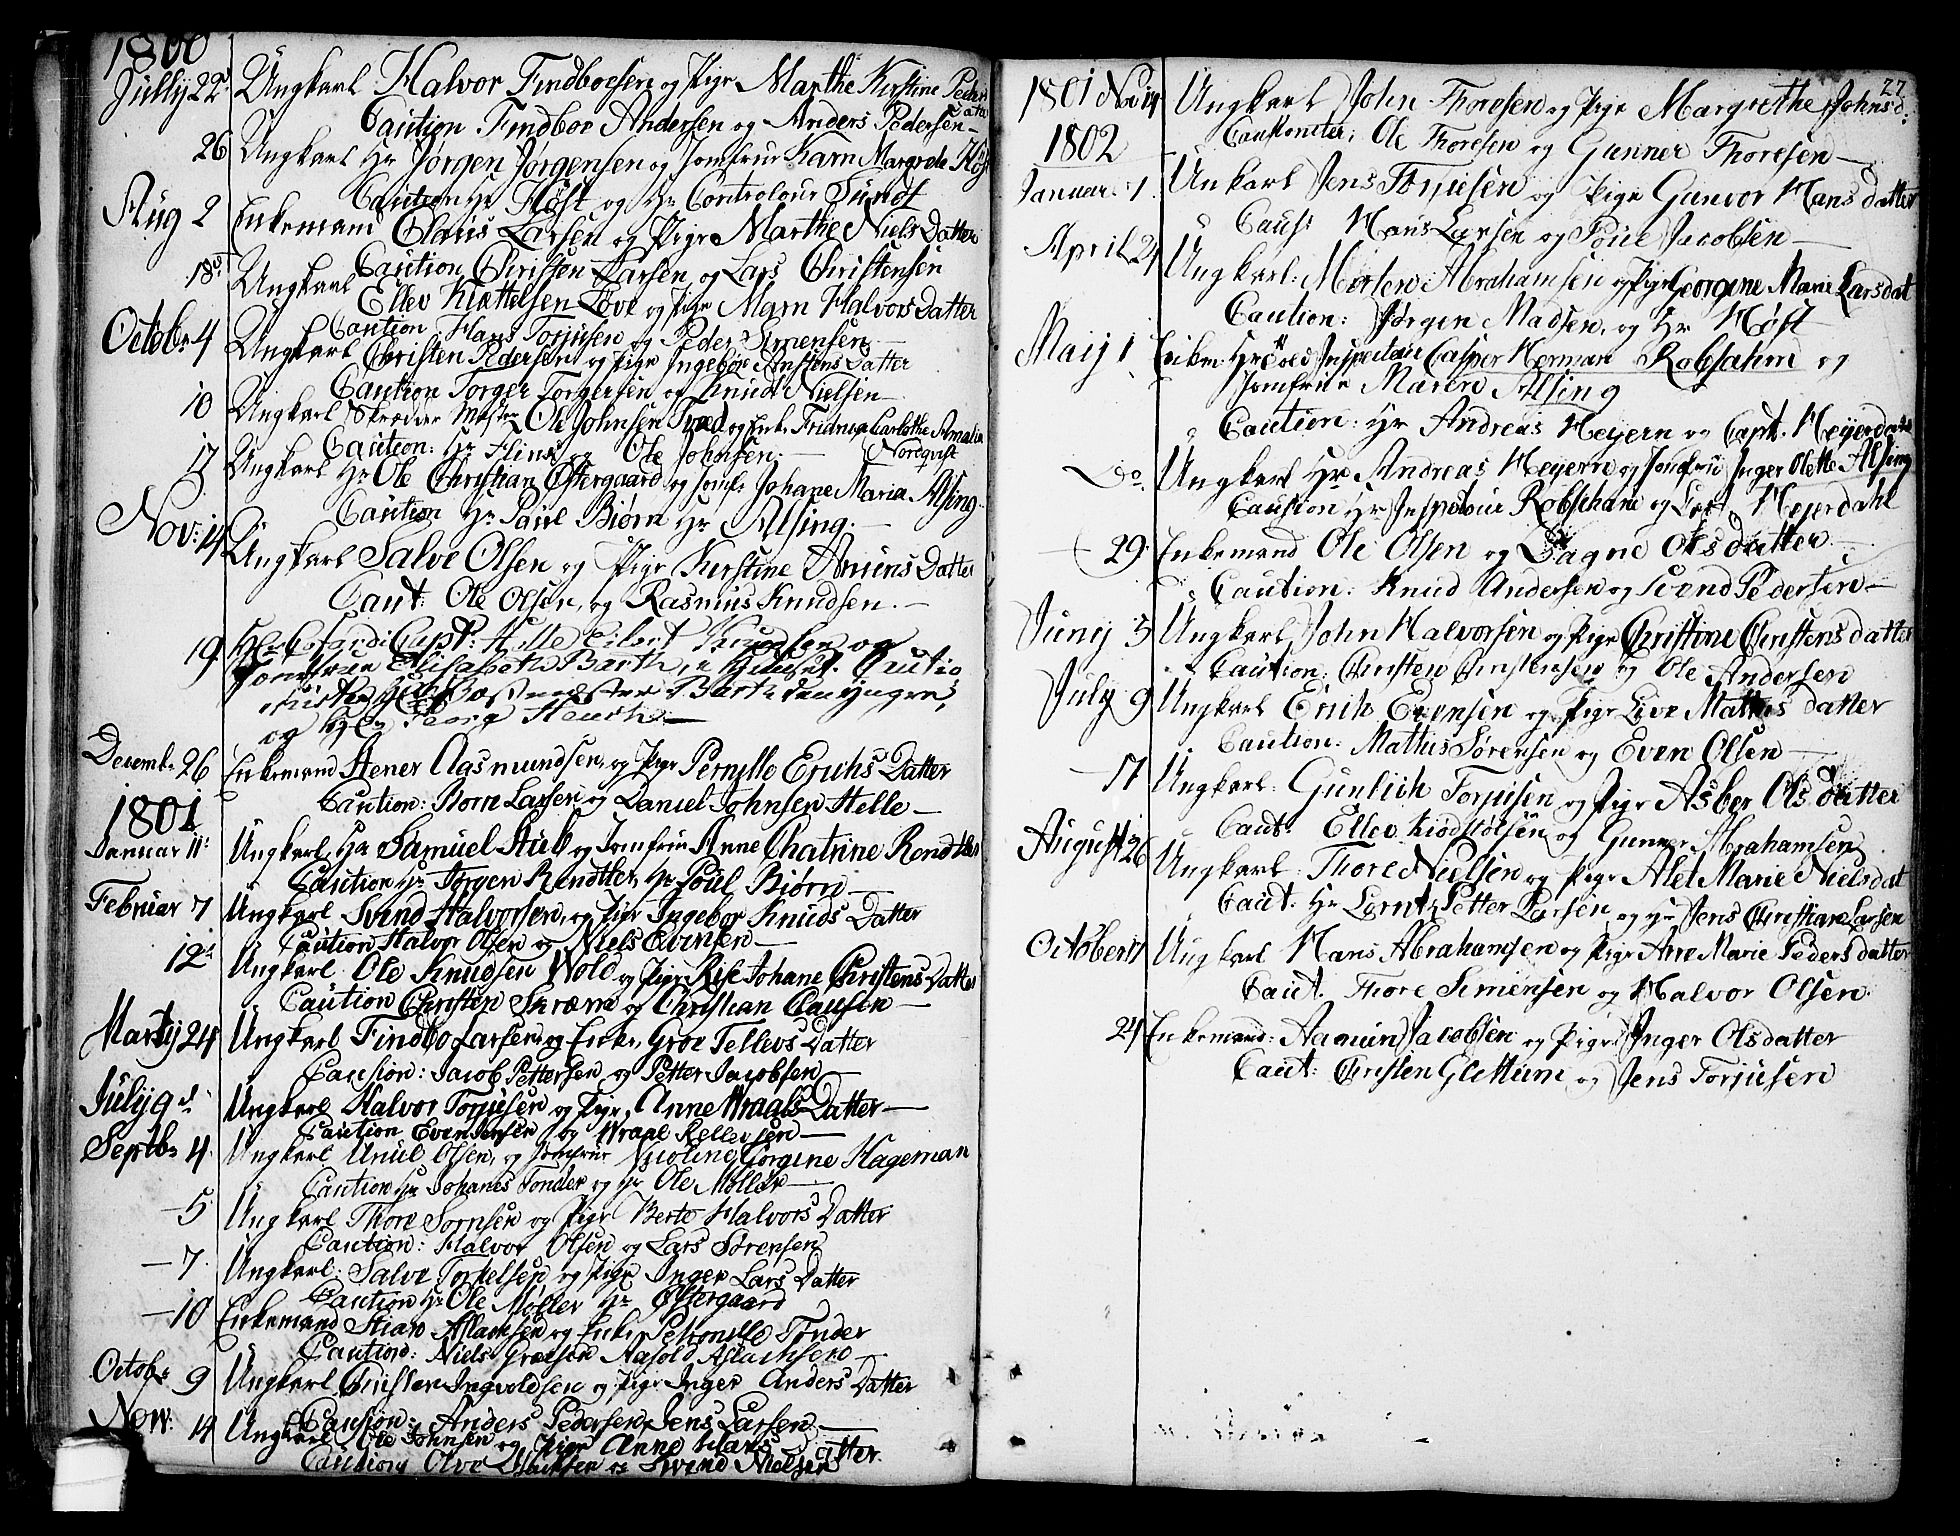 SAKO, Kragerø kirkebøker, F/Fa/L0002: Ministerialbok nr. 2, 1767-1802, s. 27